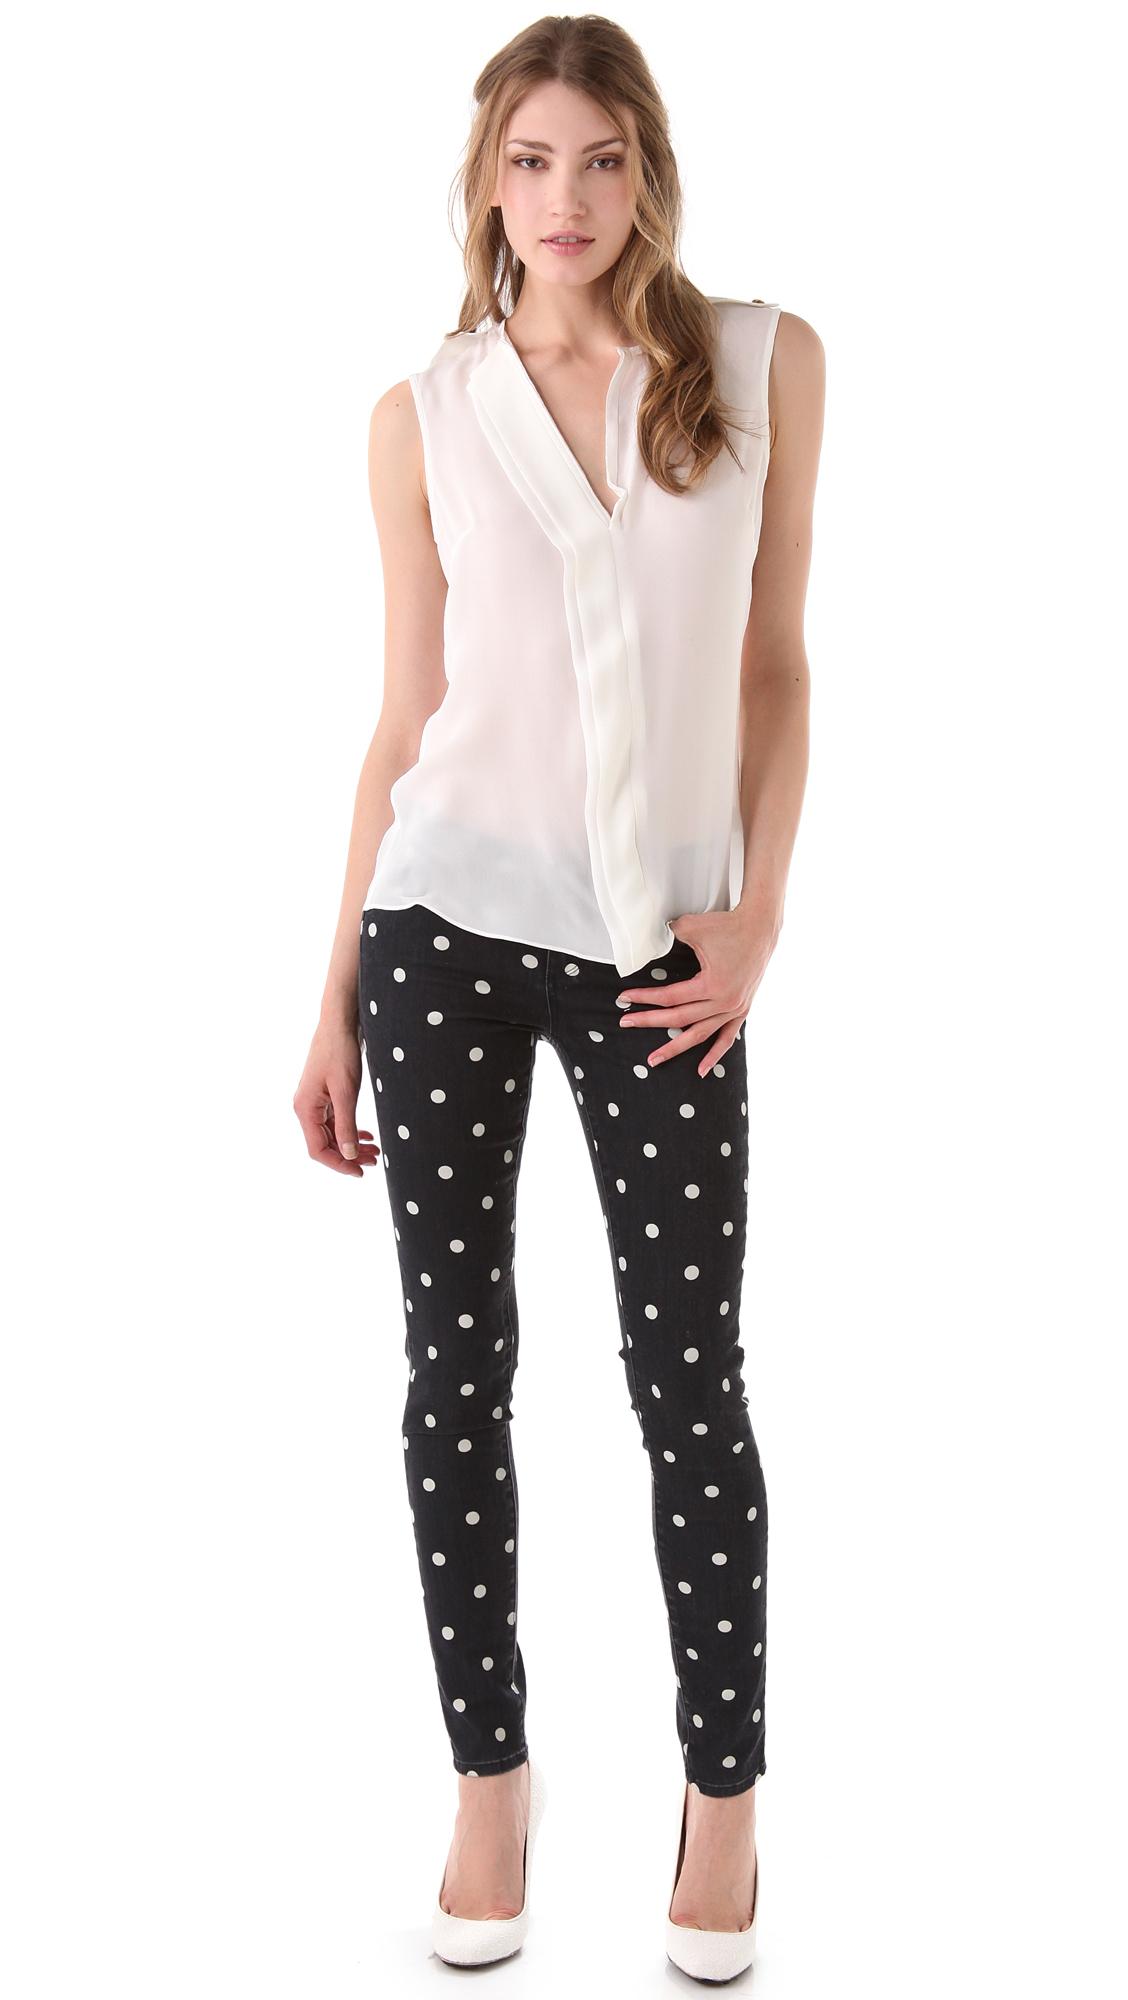 Paige polka dot verdugo skinny jeans shopbop sisterspd